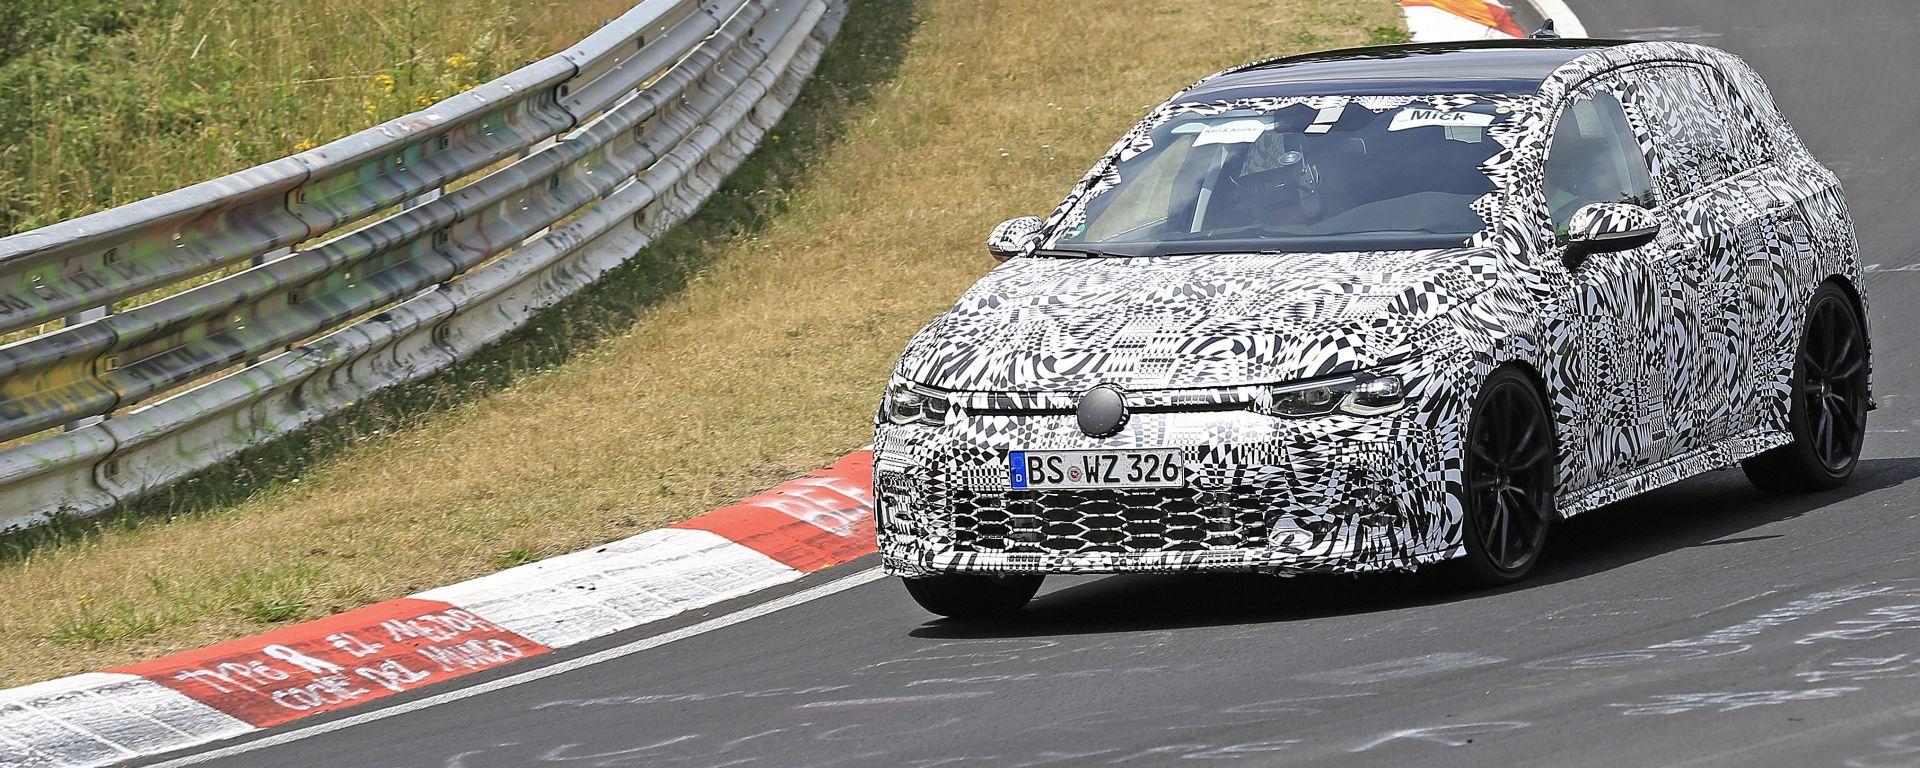 Nuova Volkswagen Golf GTI, foto spia